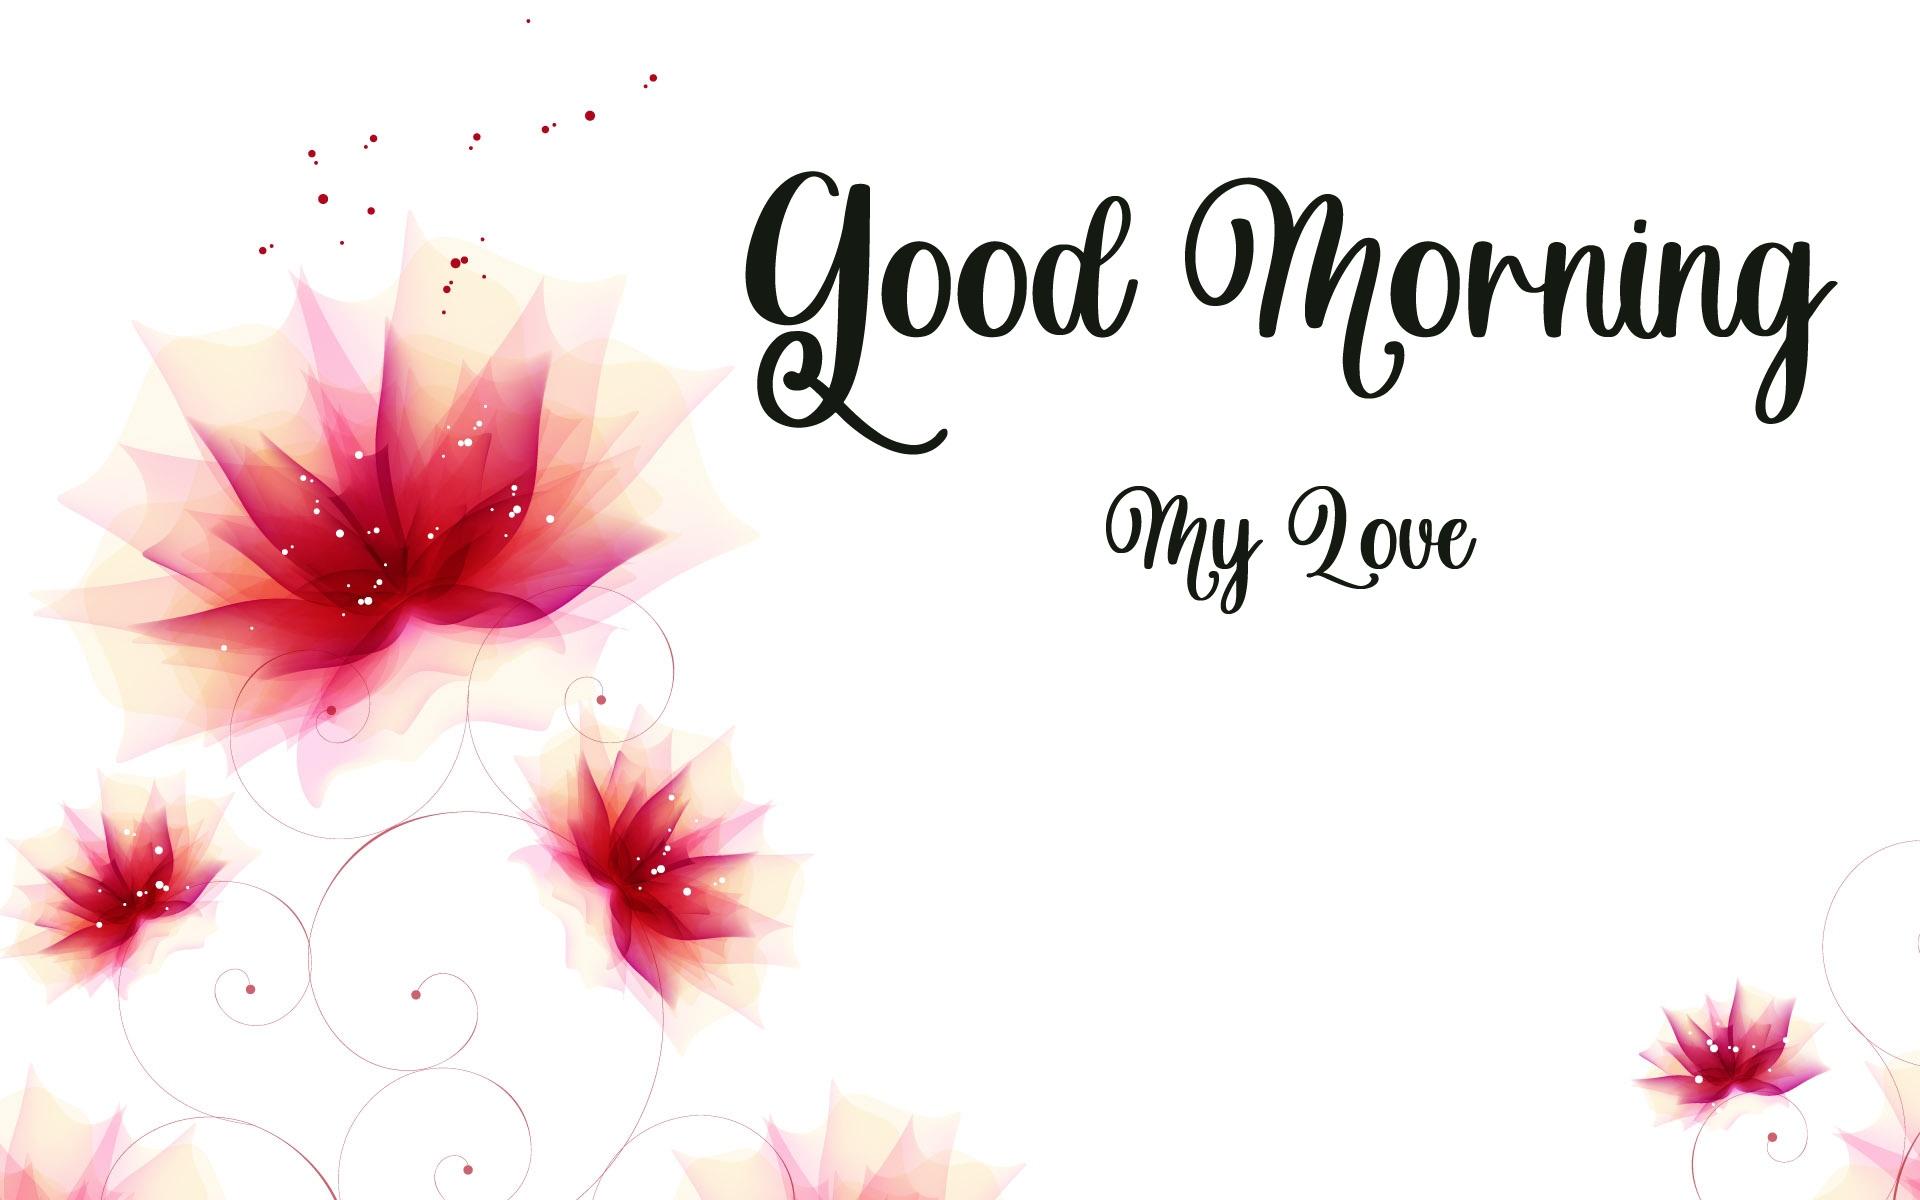 good morning images wallpaper hd 1